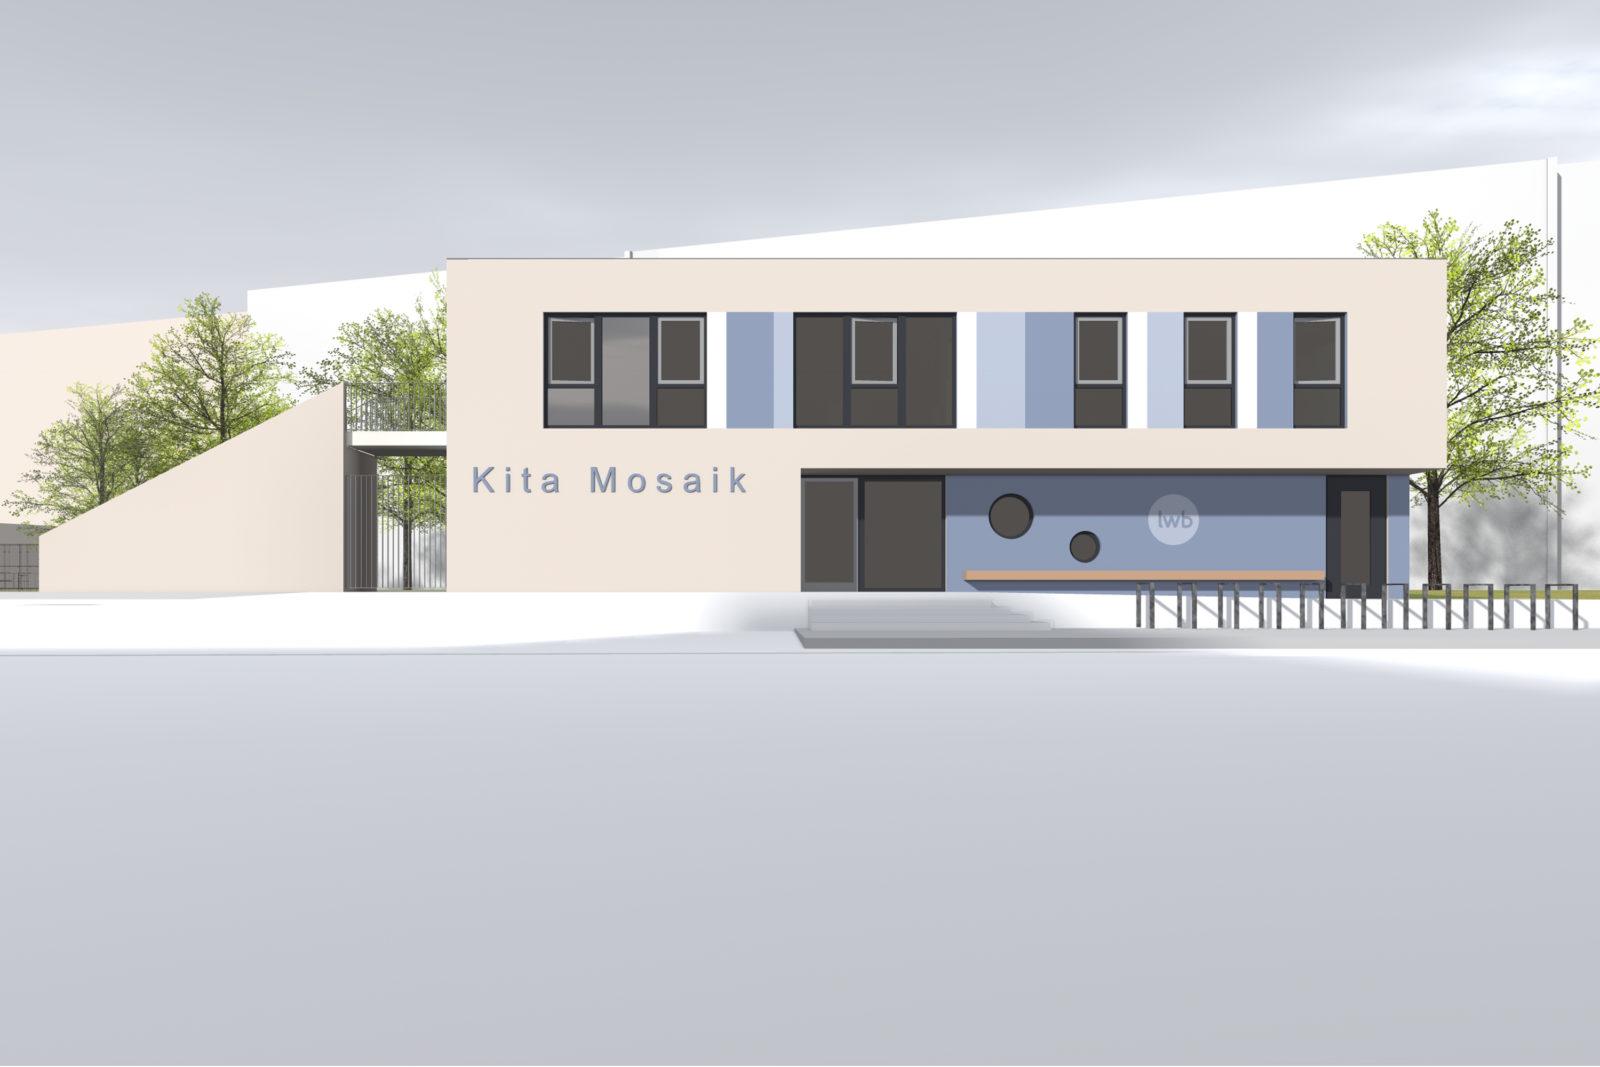 Neubau Kita Mosaik in Leipizg, Zentrum Süd - Eingangsbereich